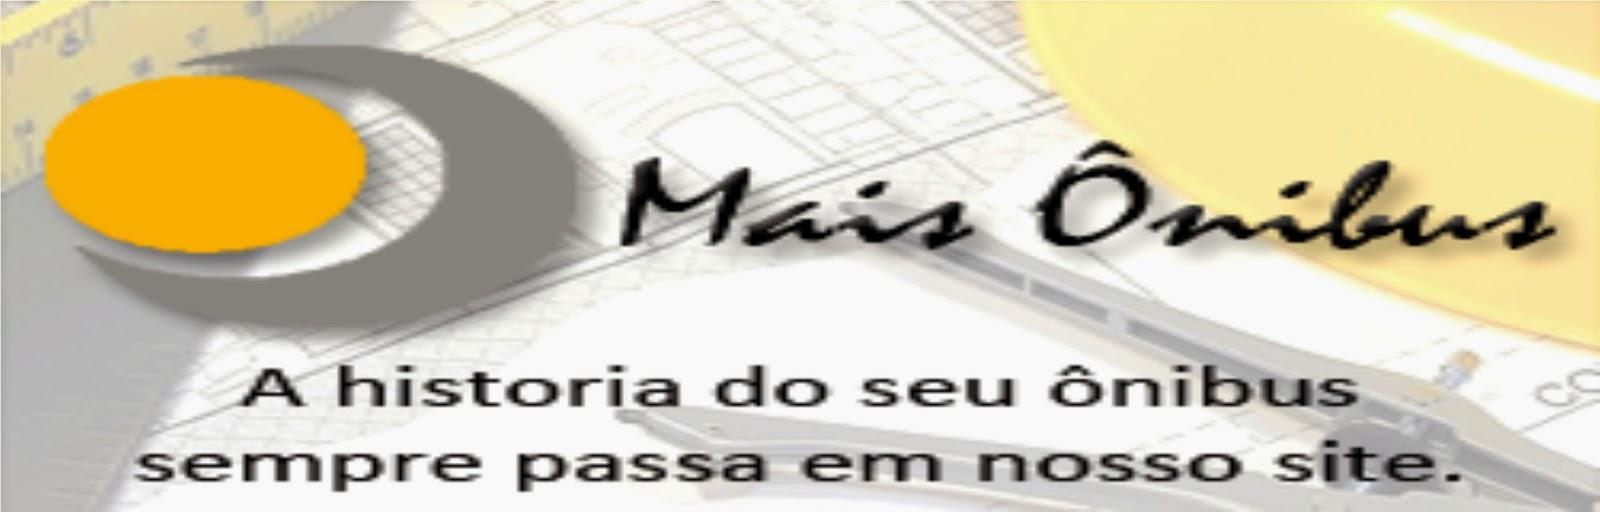 http://maisonibus.blogspot.com.br/